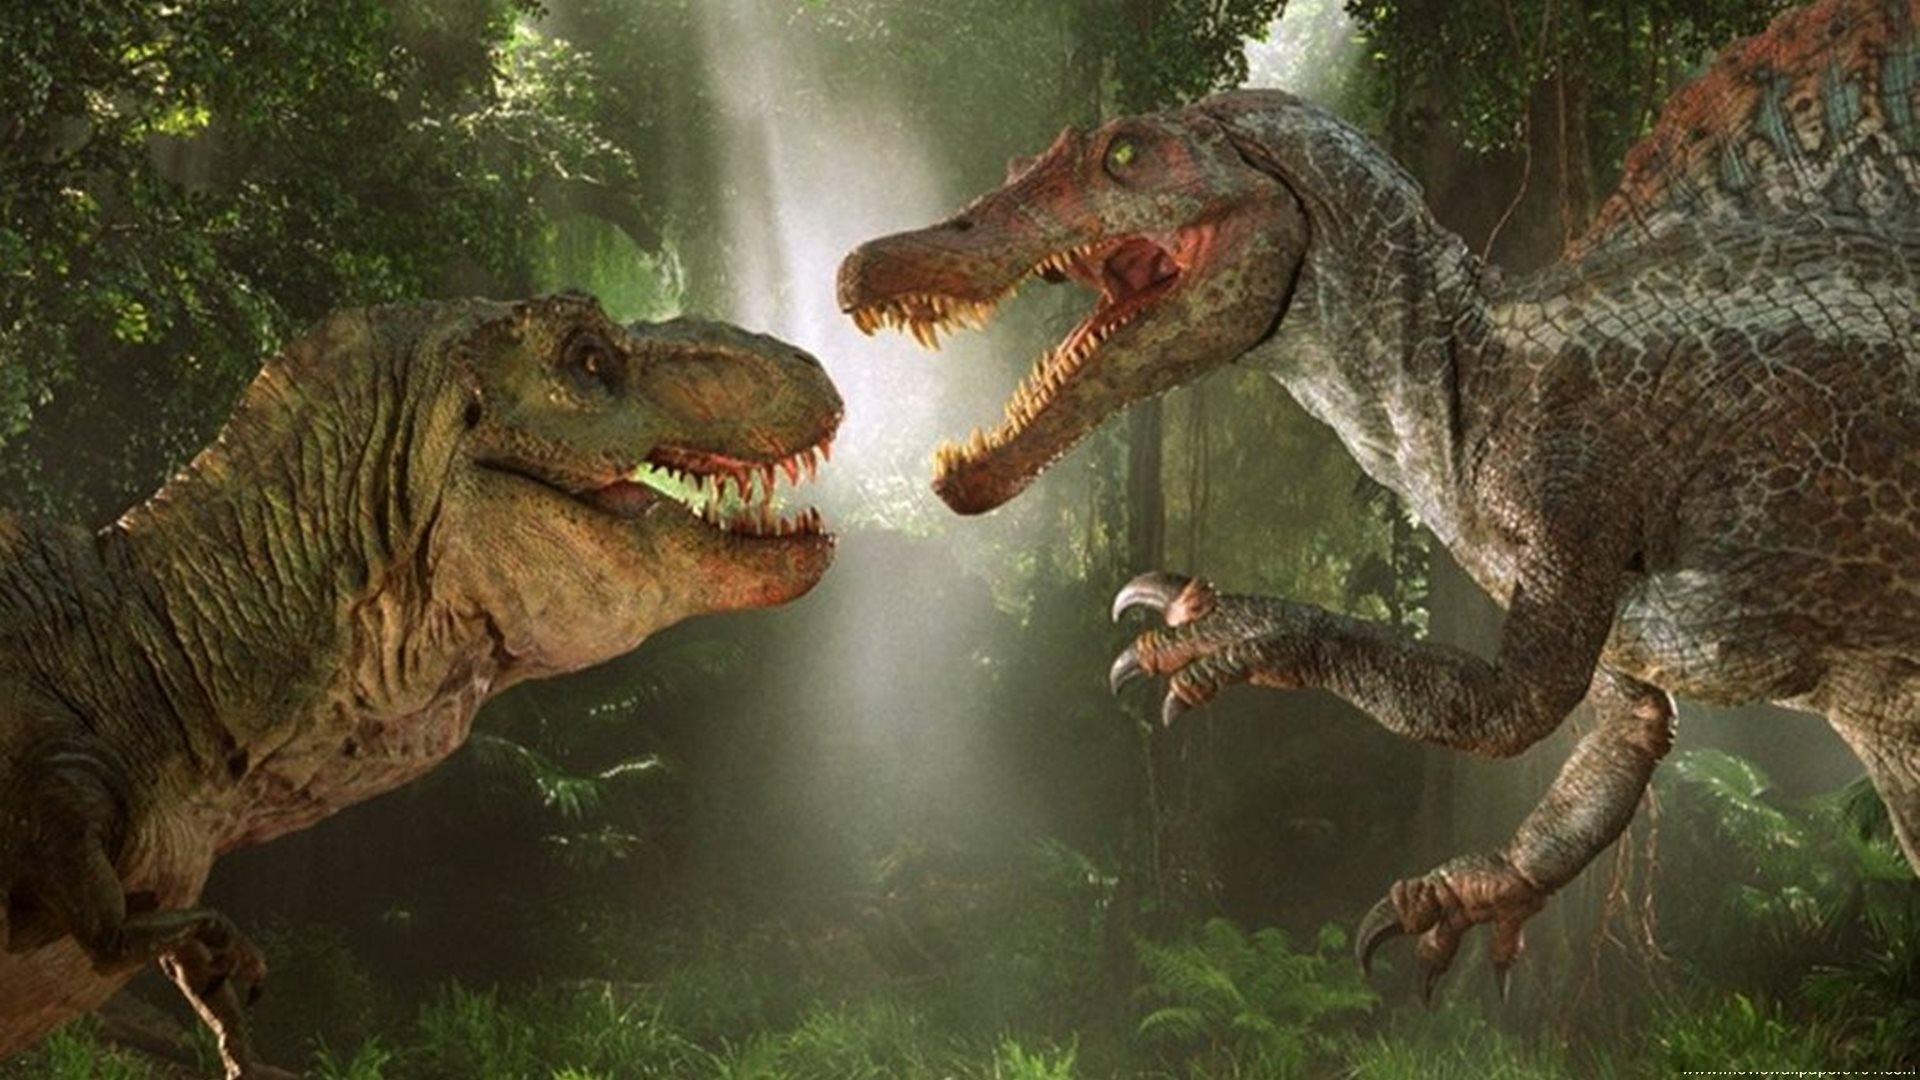 Magnificent Dinosaur Wallpaper Design Ideas